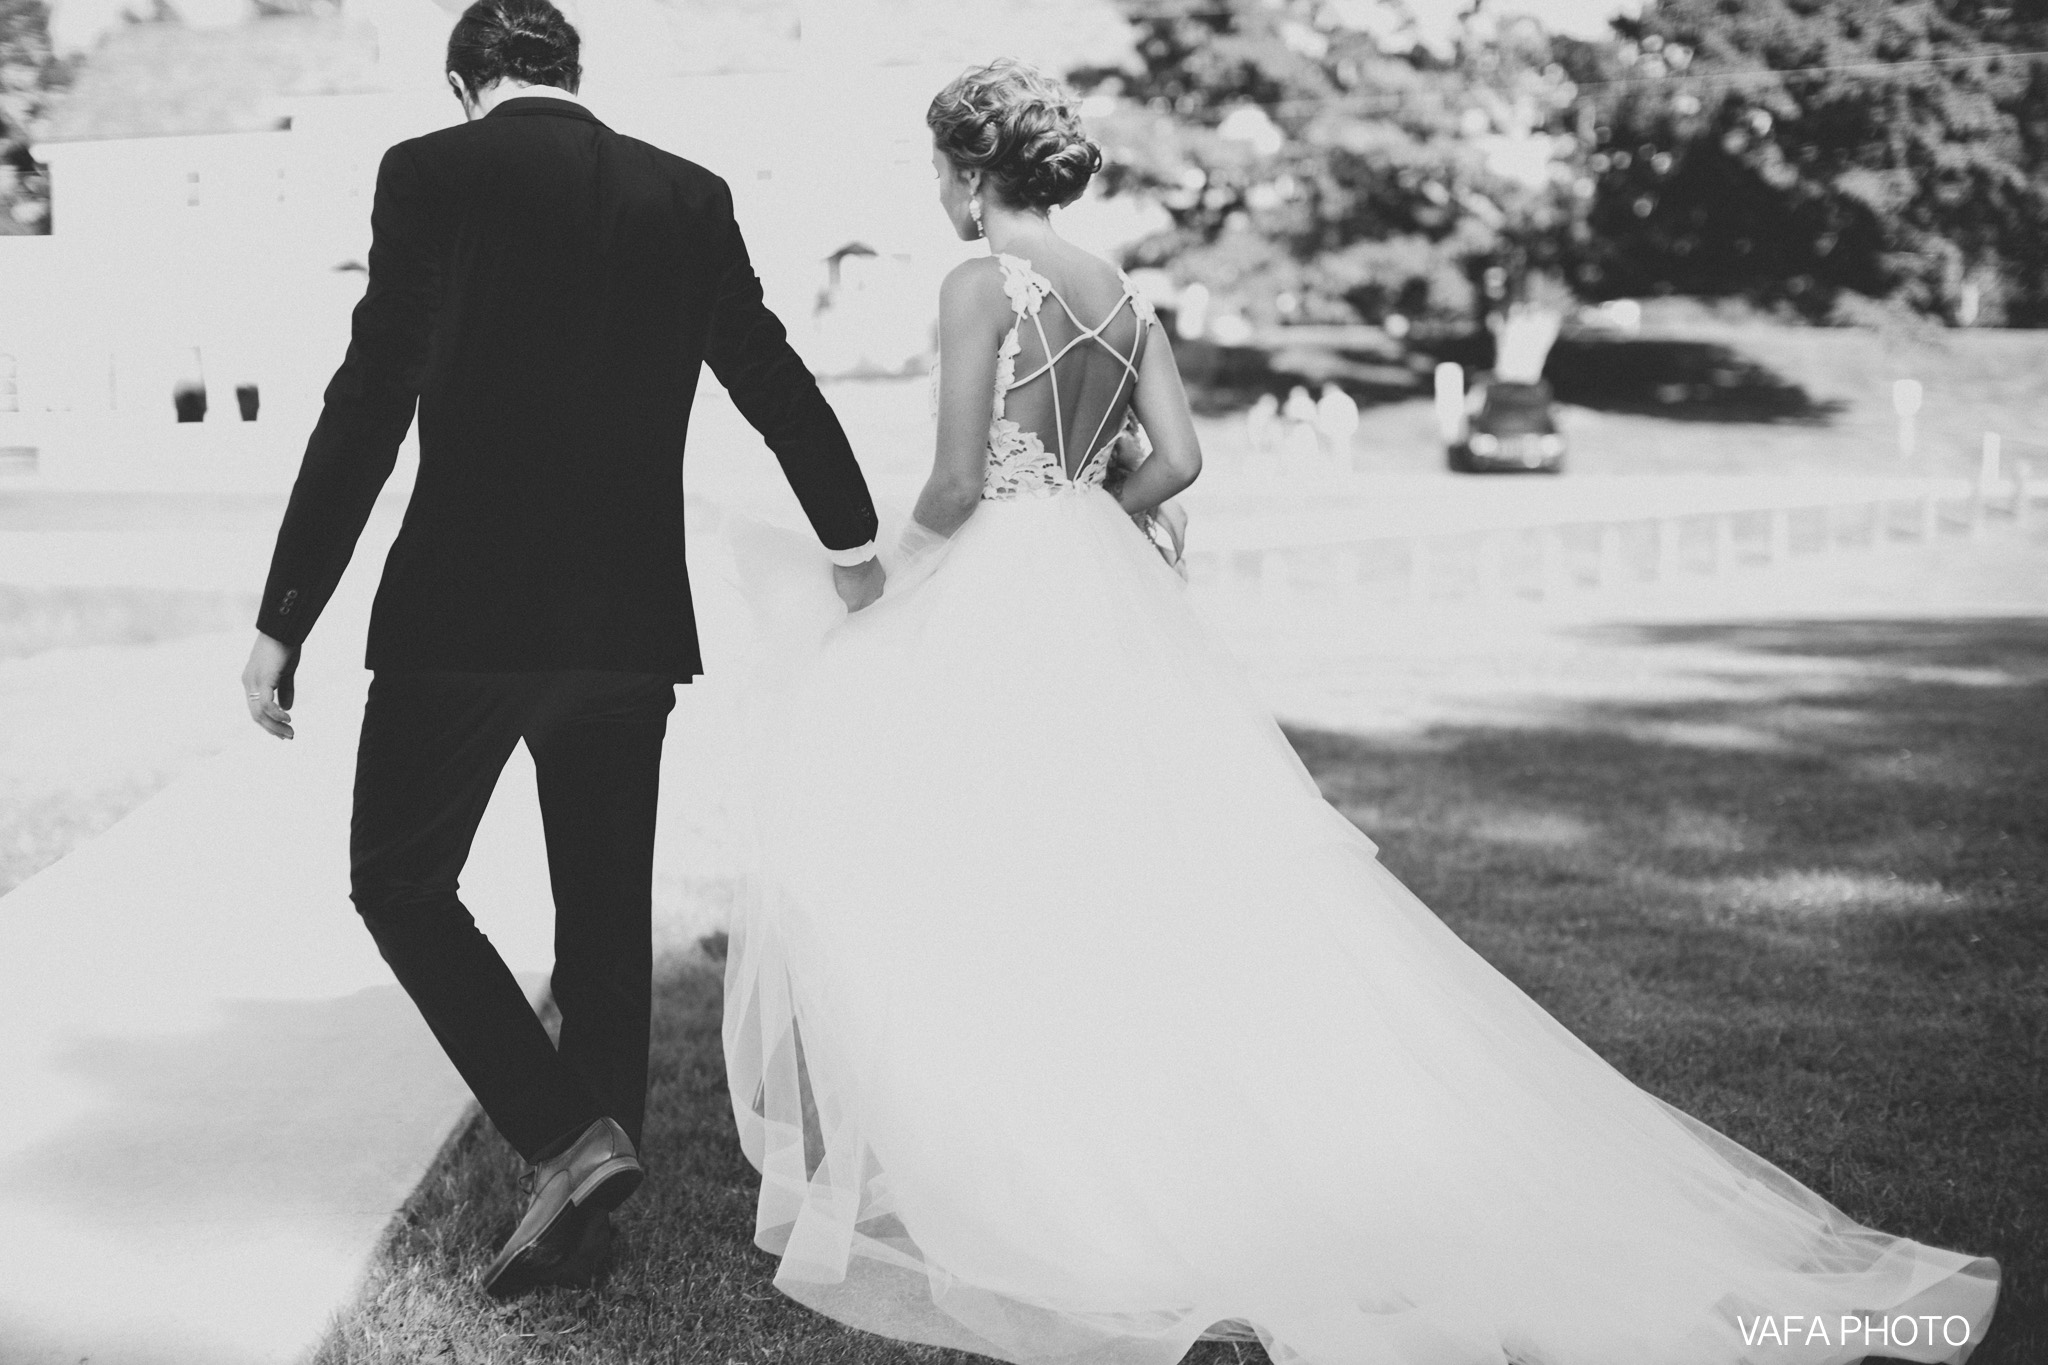 The-Felt-Estate-Wedding-Kailie-David-Vafa-Photo-591.jpg